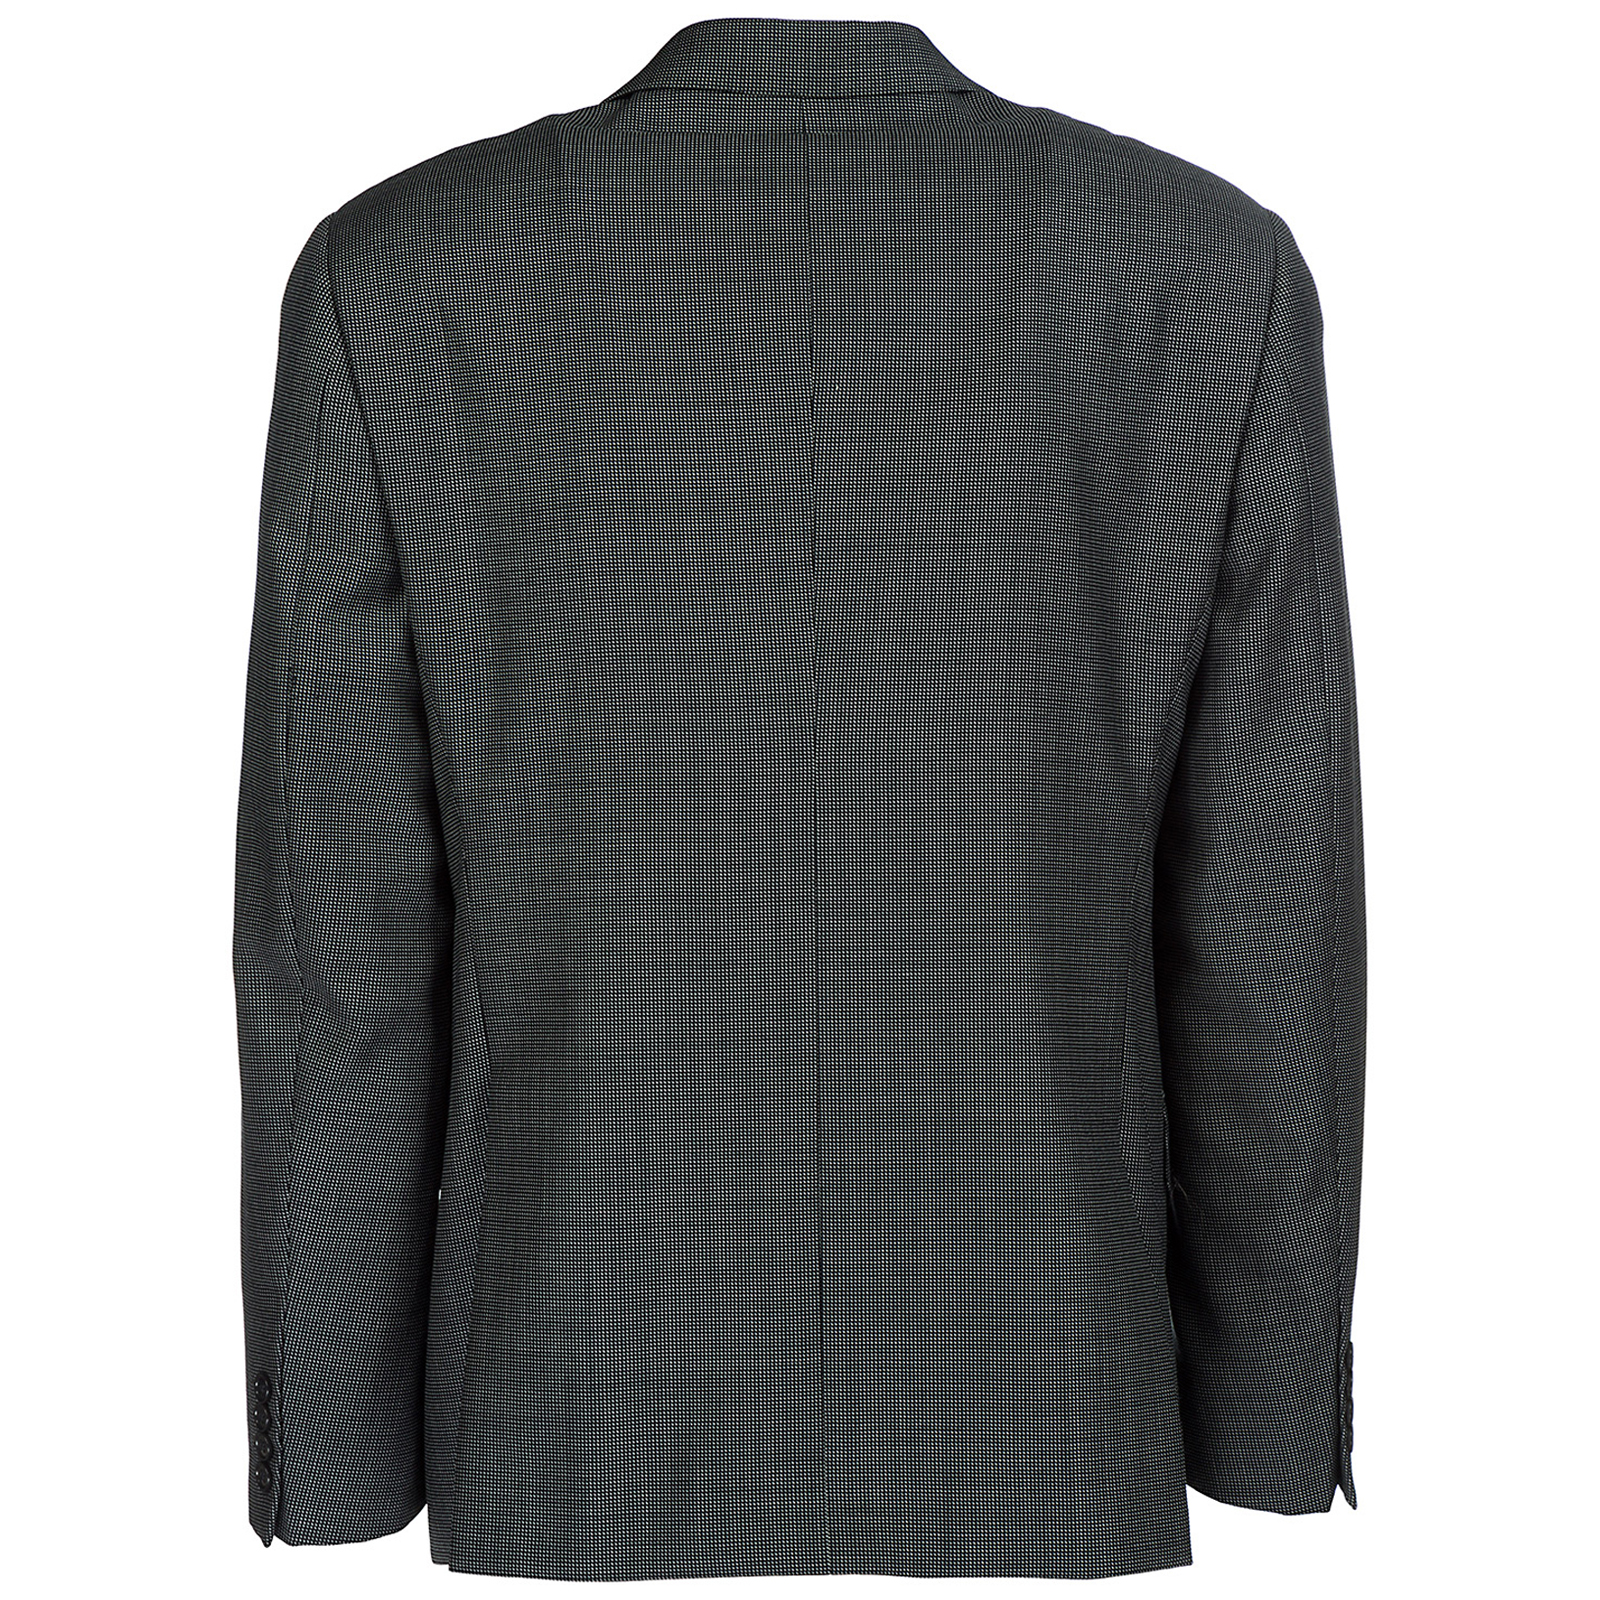 6c60874faab2 Men s suit Men s suit Men s suit Men s suit ...